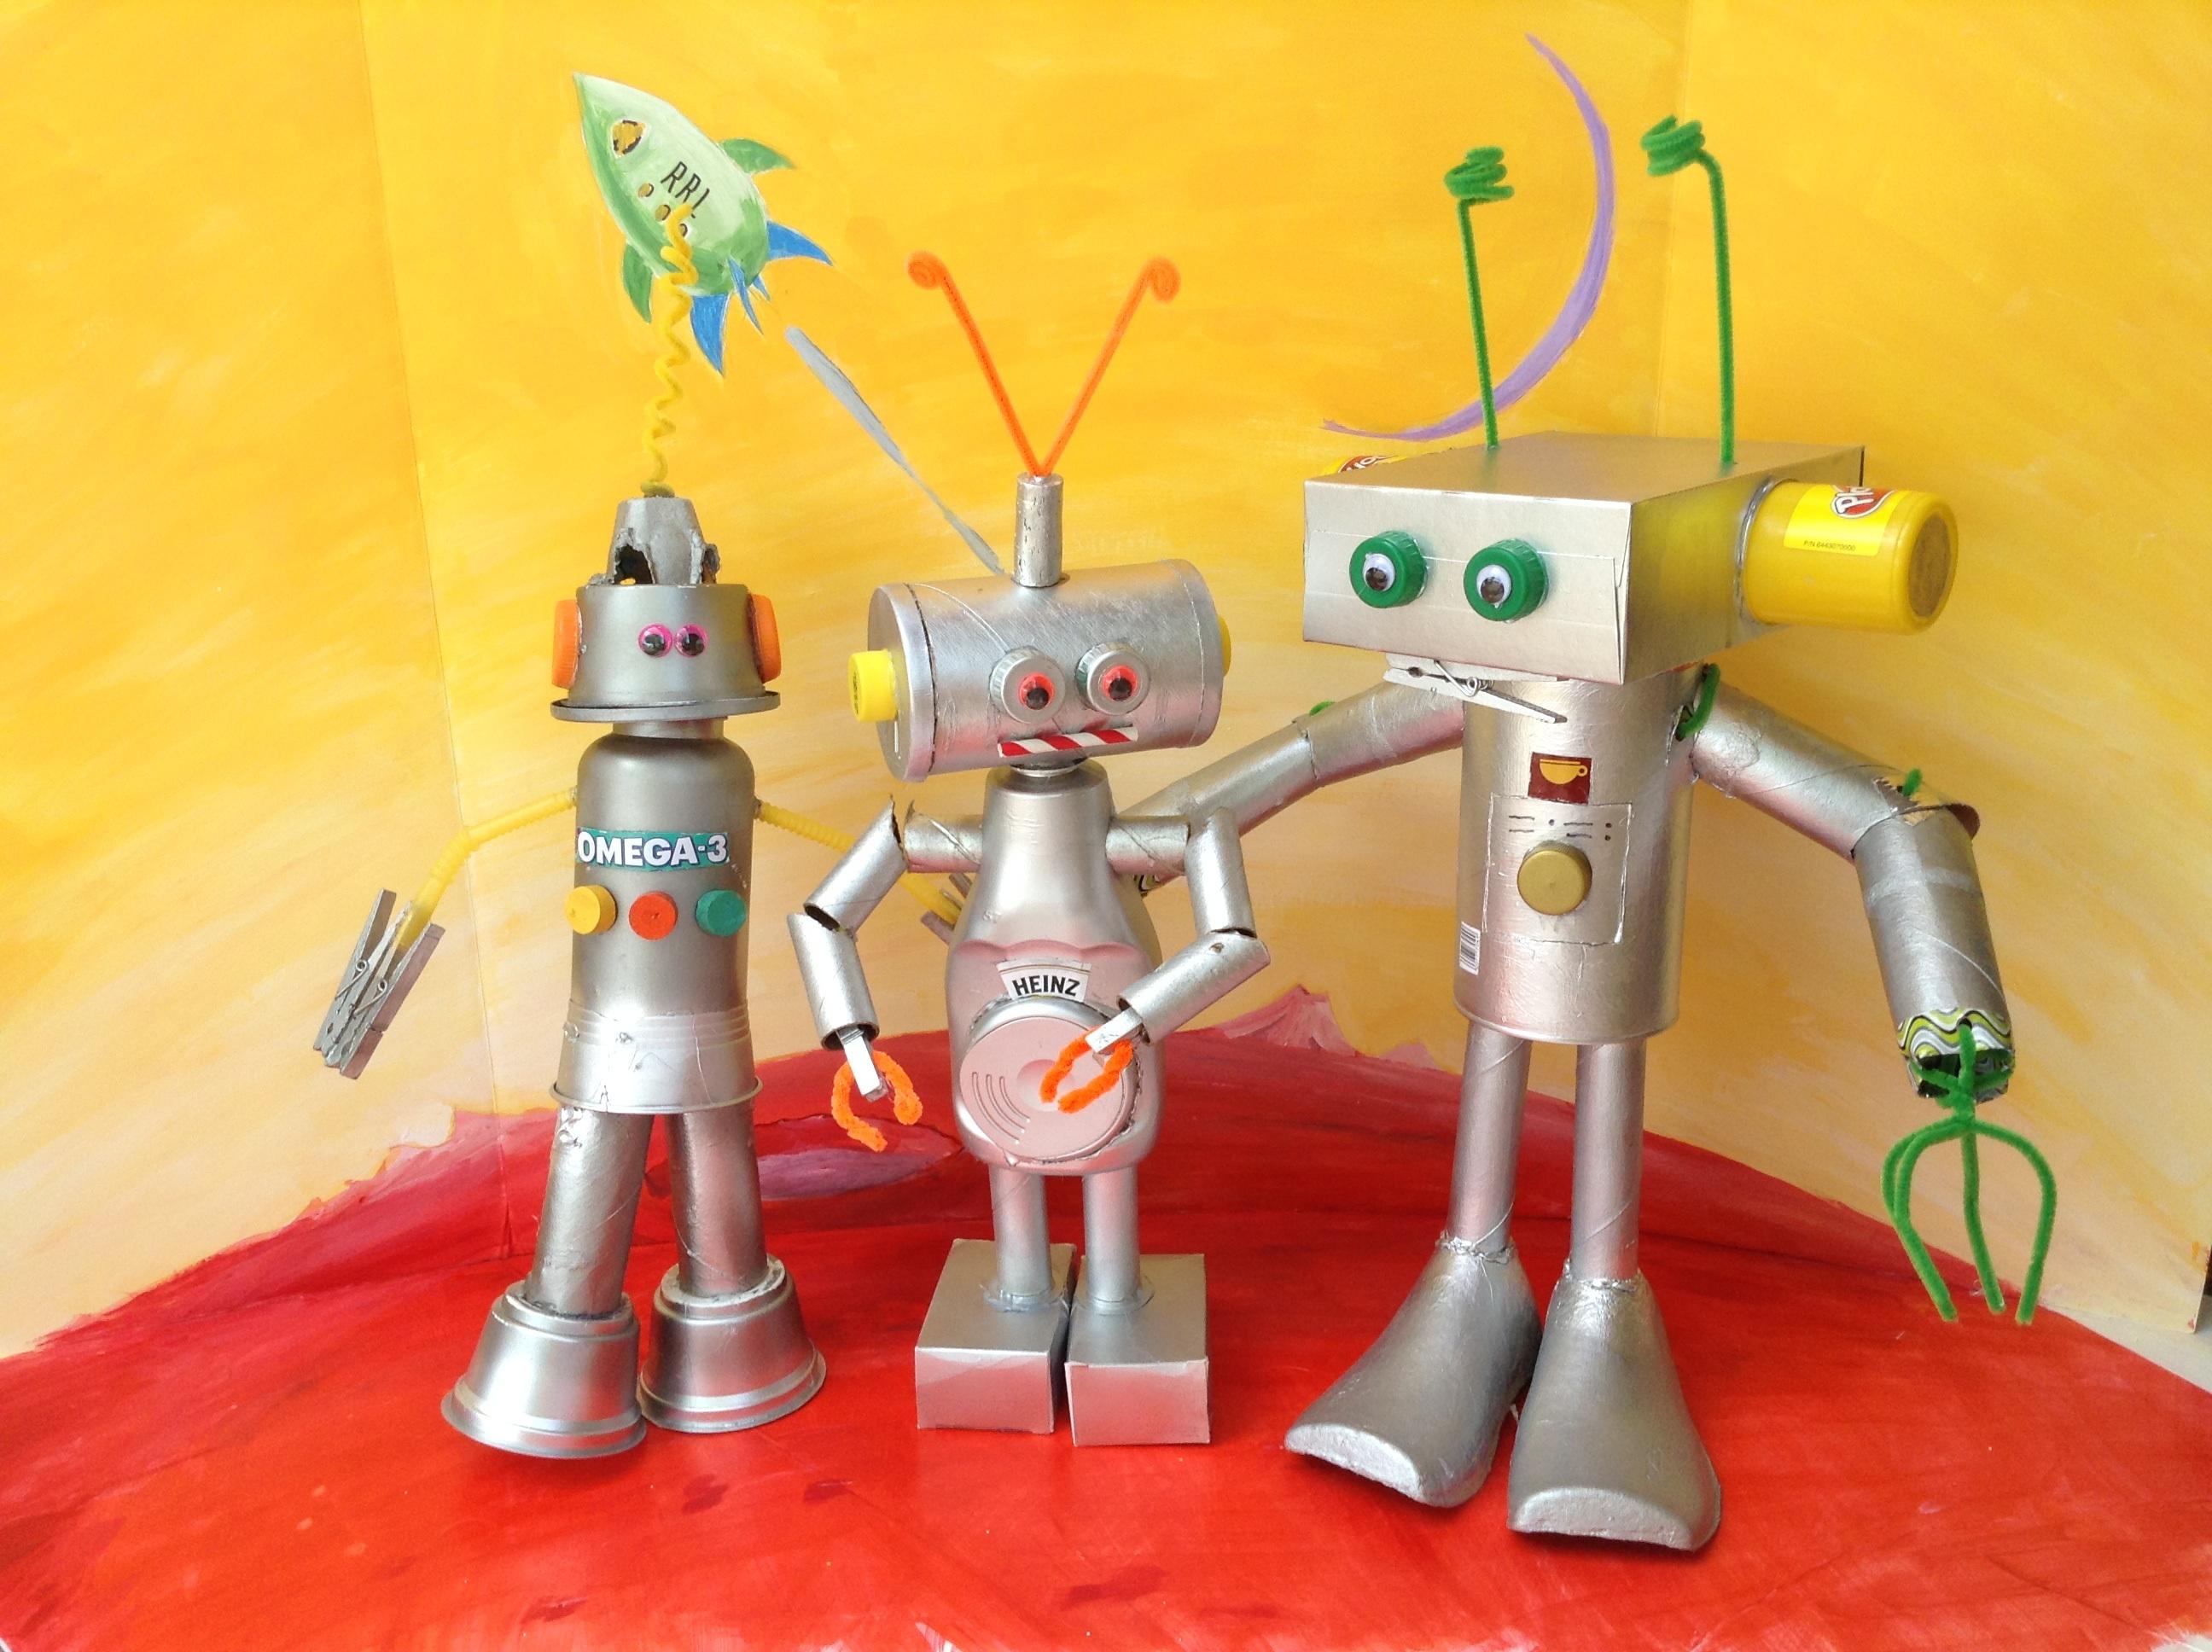 Toys superhero underpants meet the recycle robots solutioingenieria Gallery